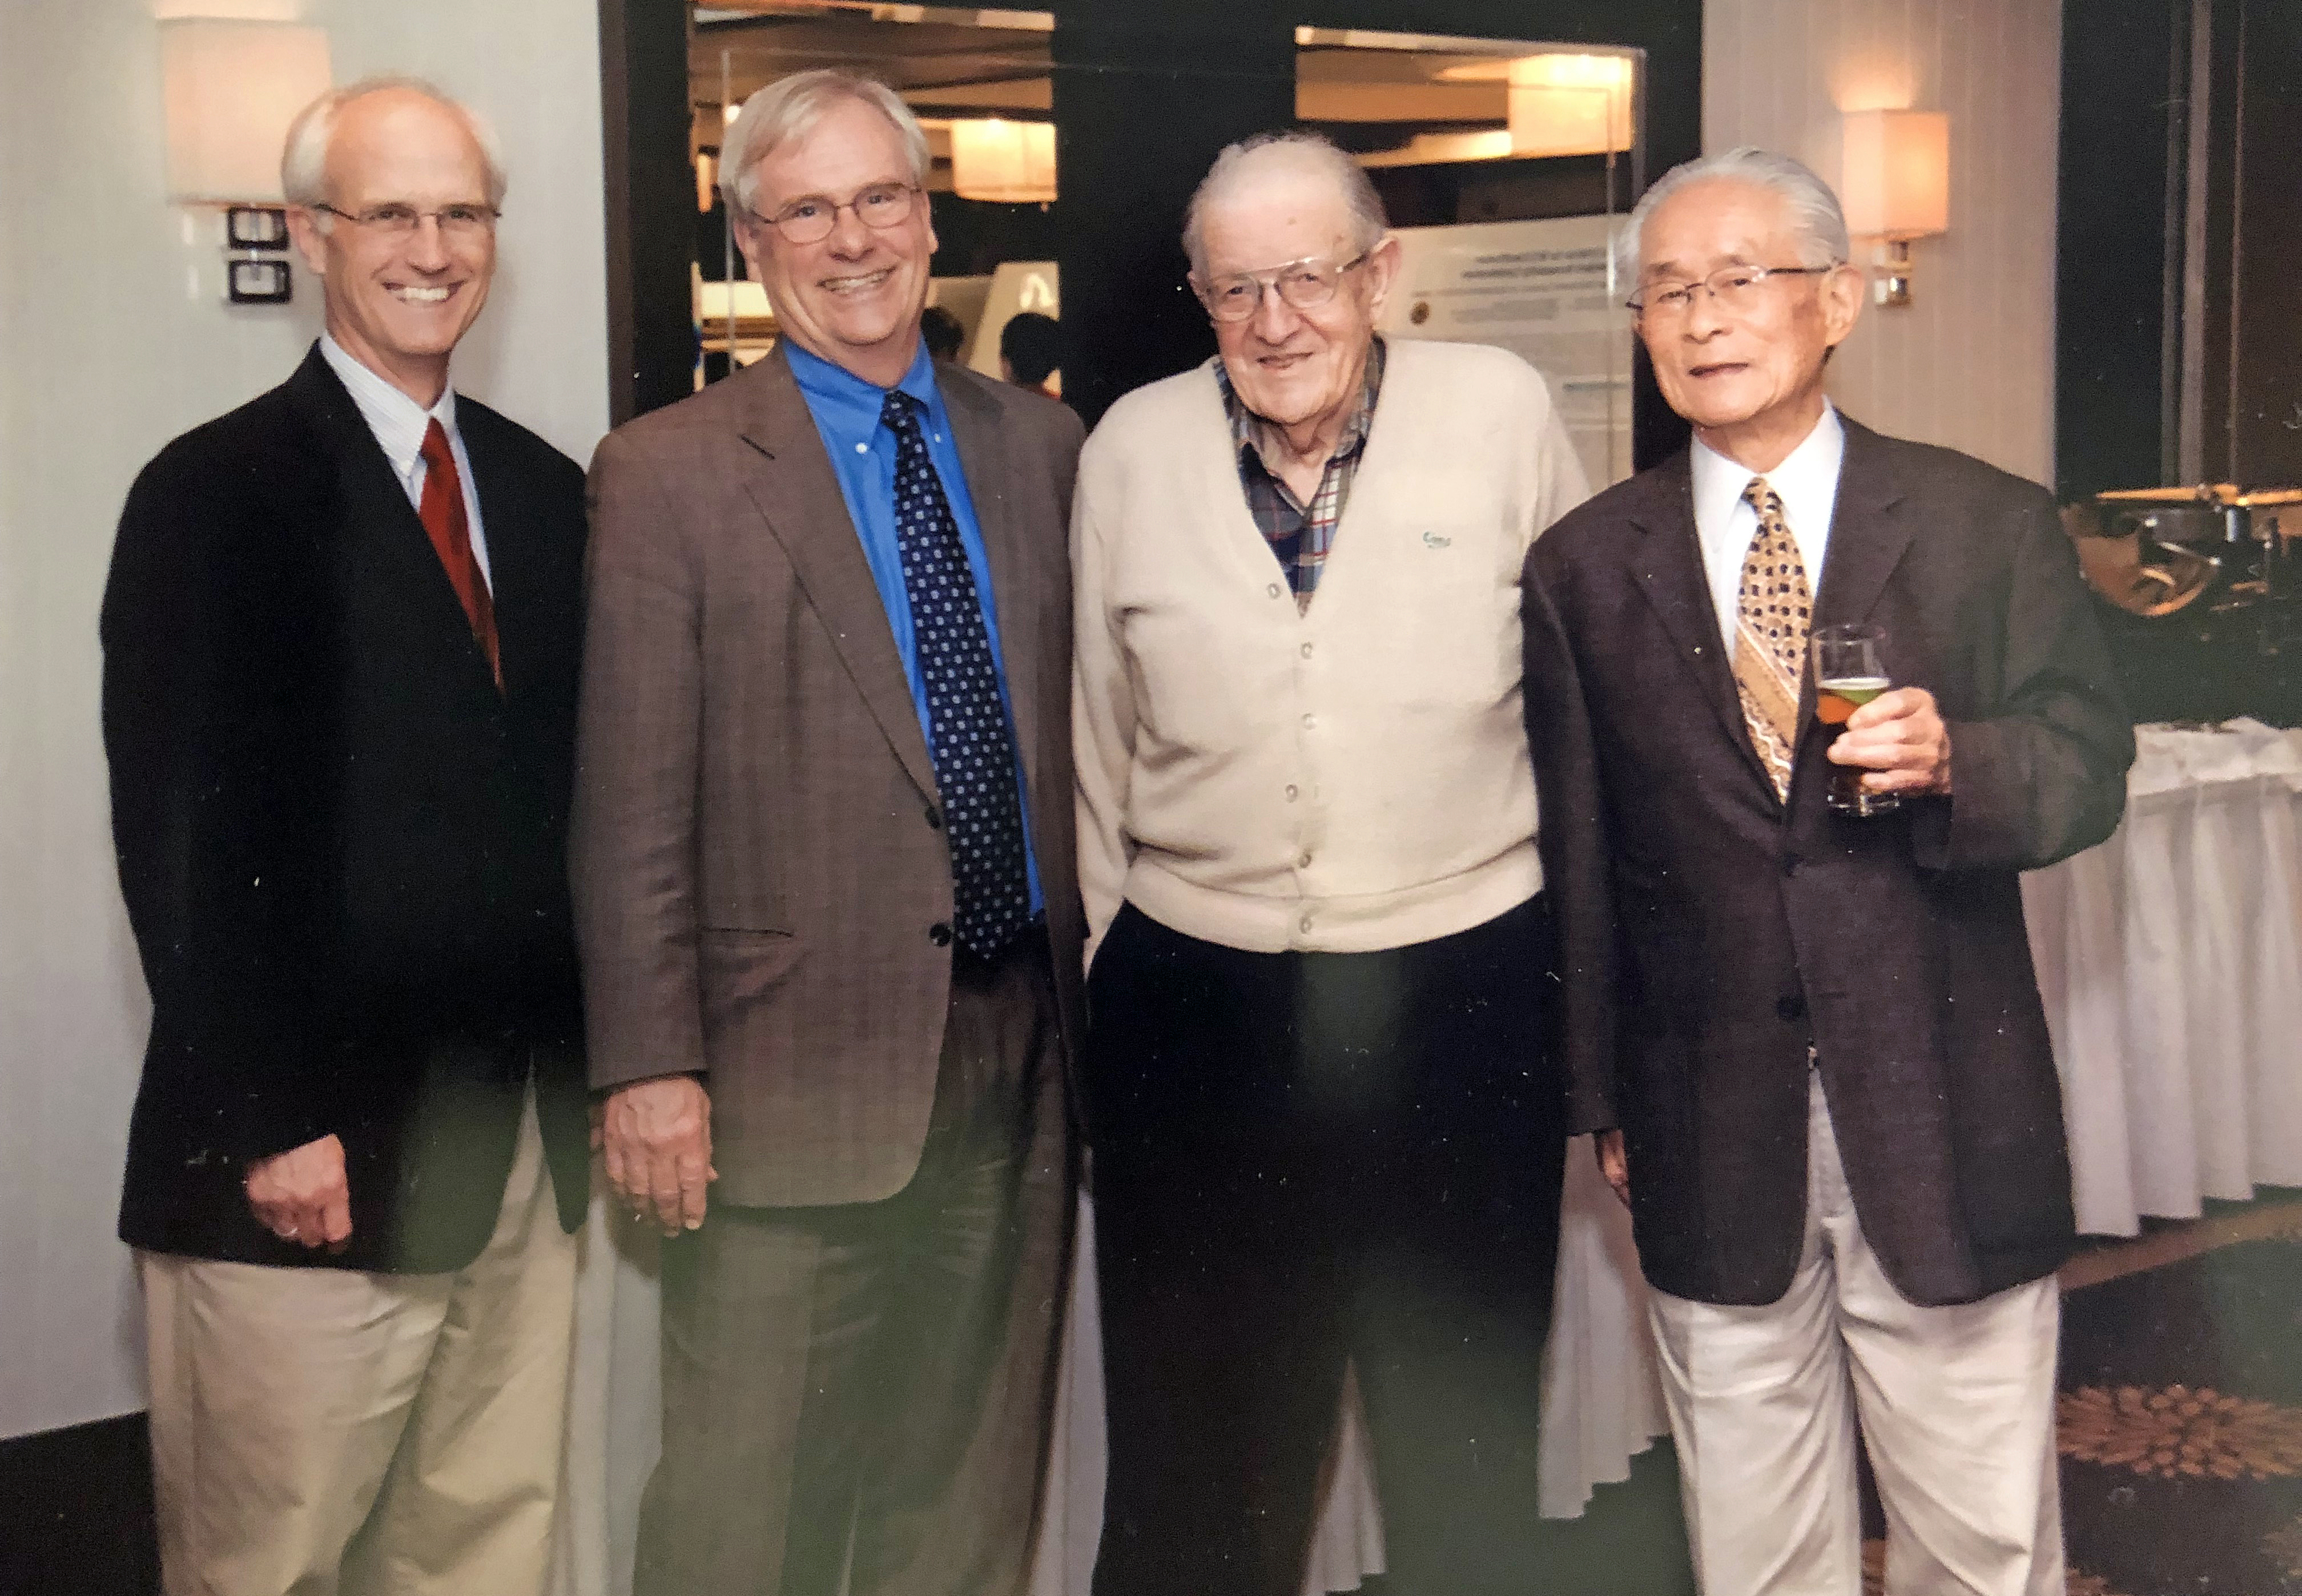 Left to right: Greg Amidon, Gordon Amidon, Everett N. Hiestand, and William Higuchi.